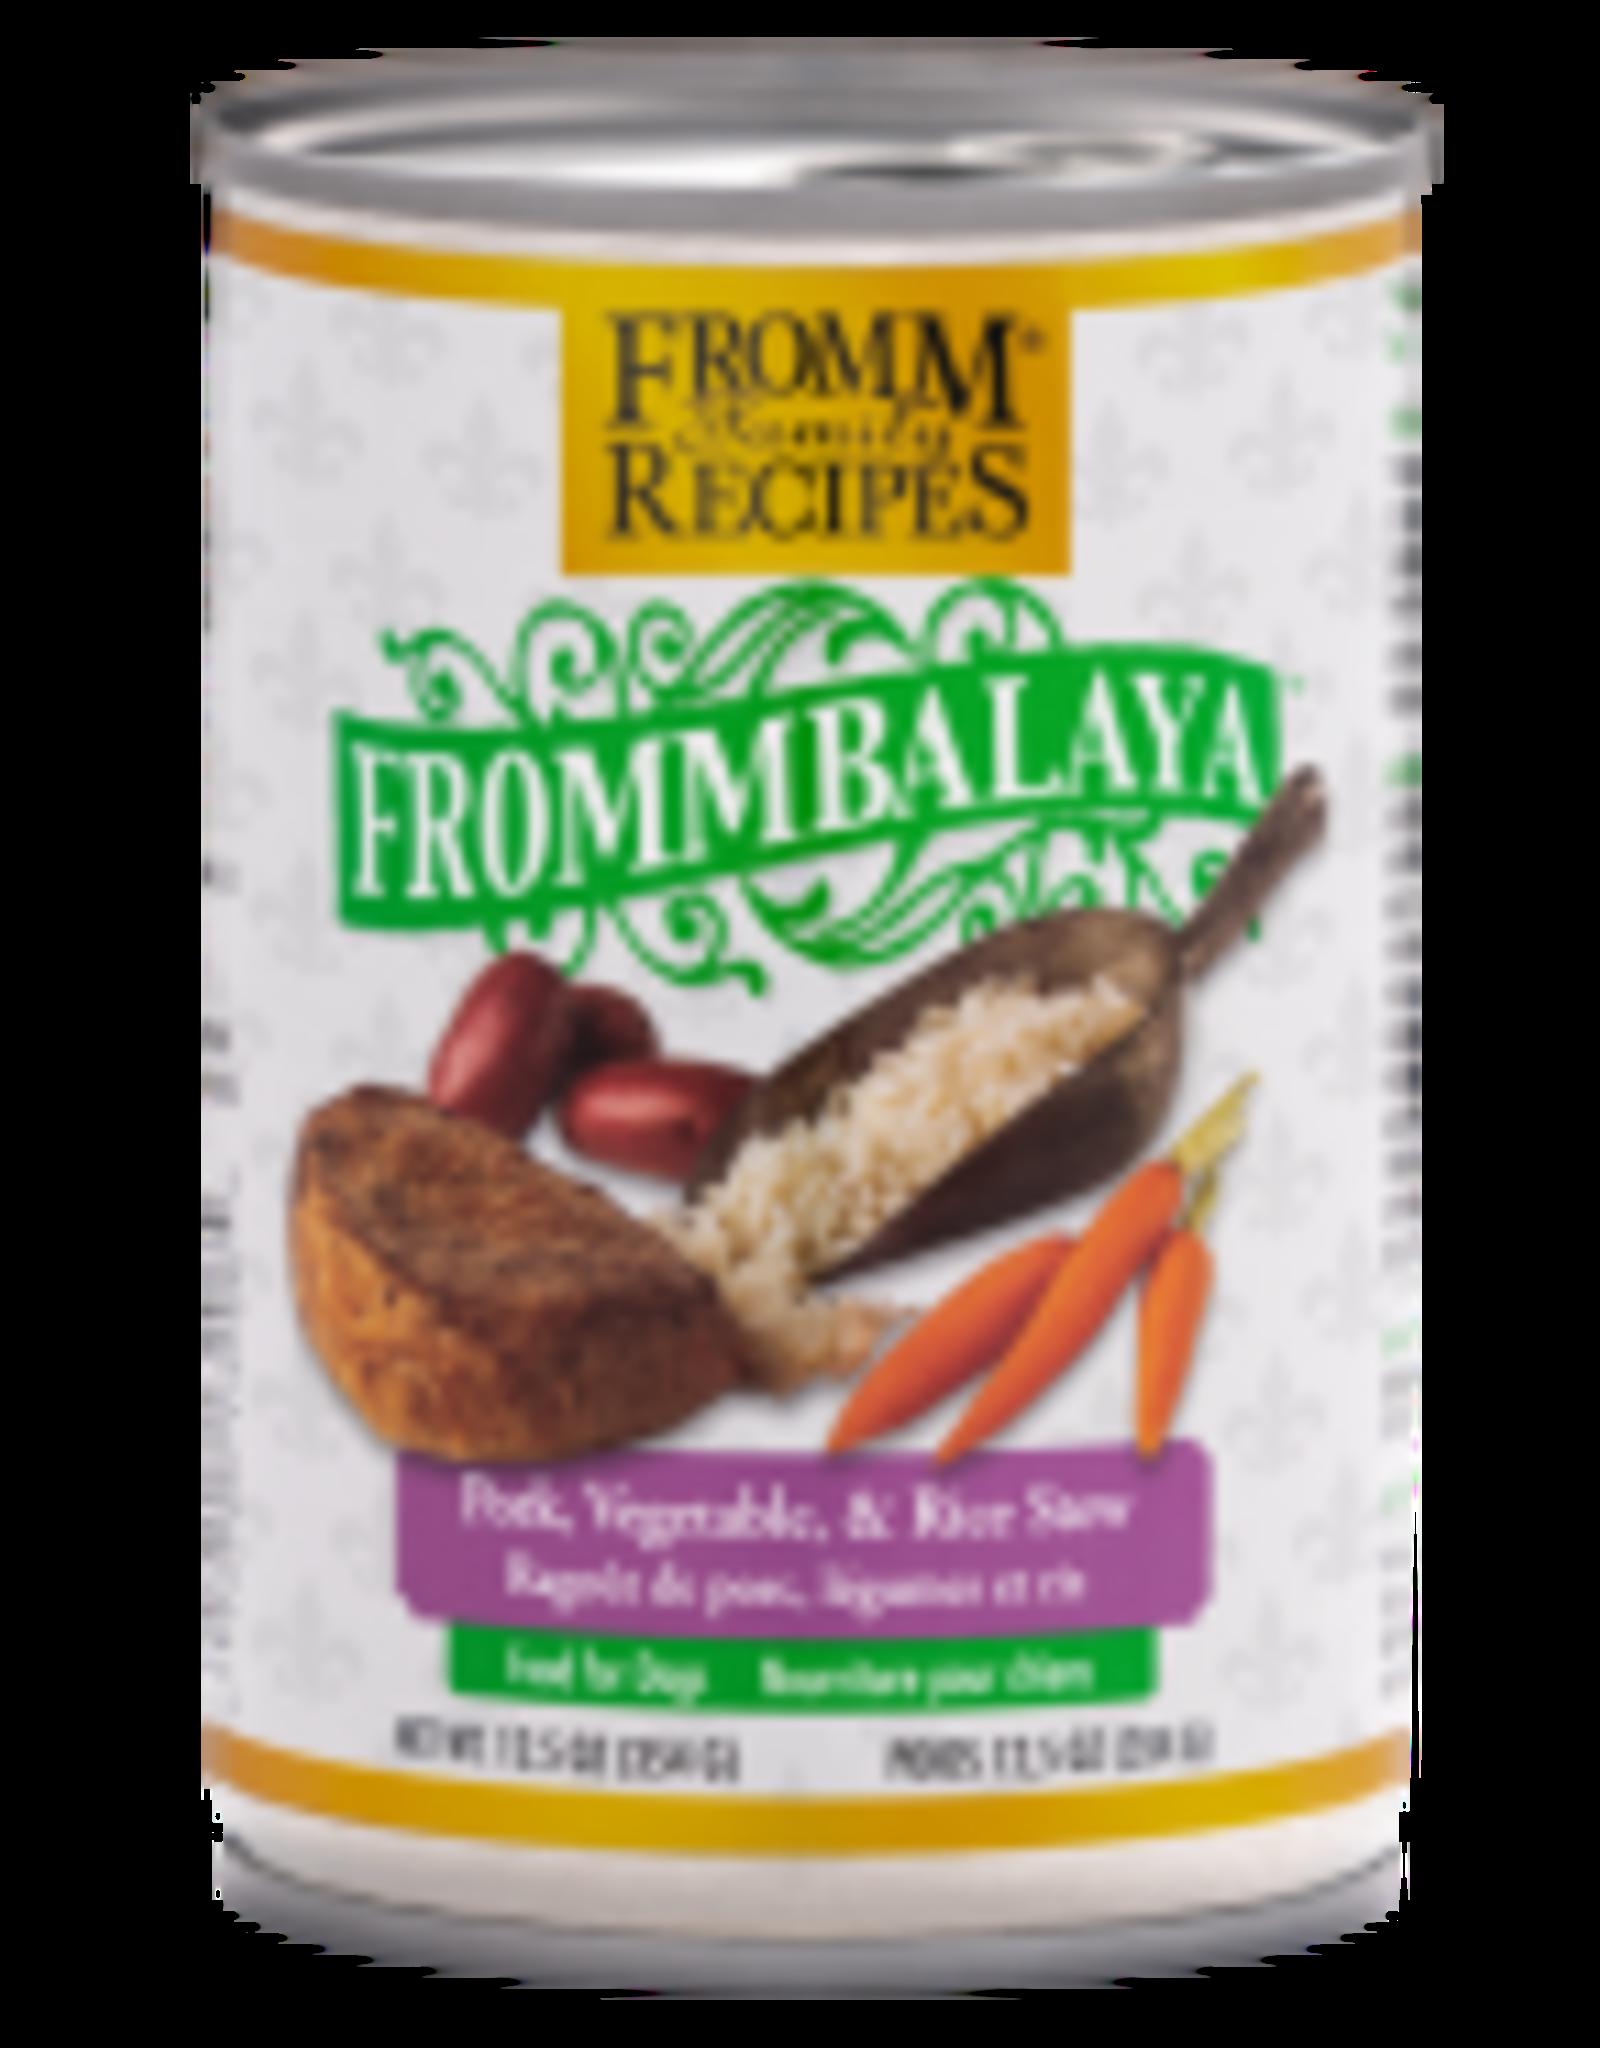 Fromm Fromm Dog Frommbalaya Pork Veg & Rice Stew 12.5 oz